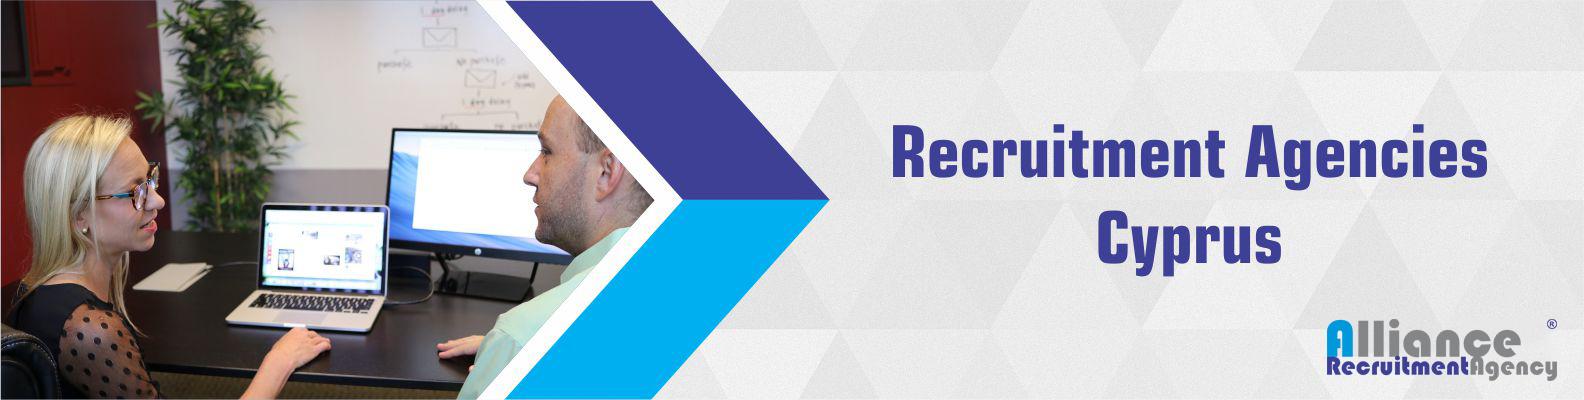 Recruitment Agencies Cyprus